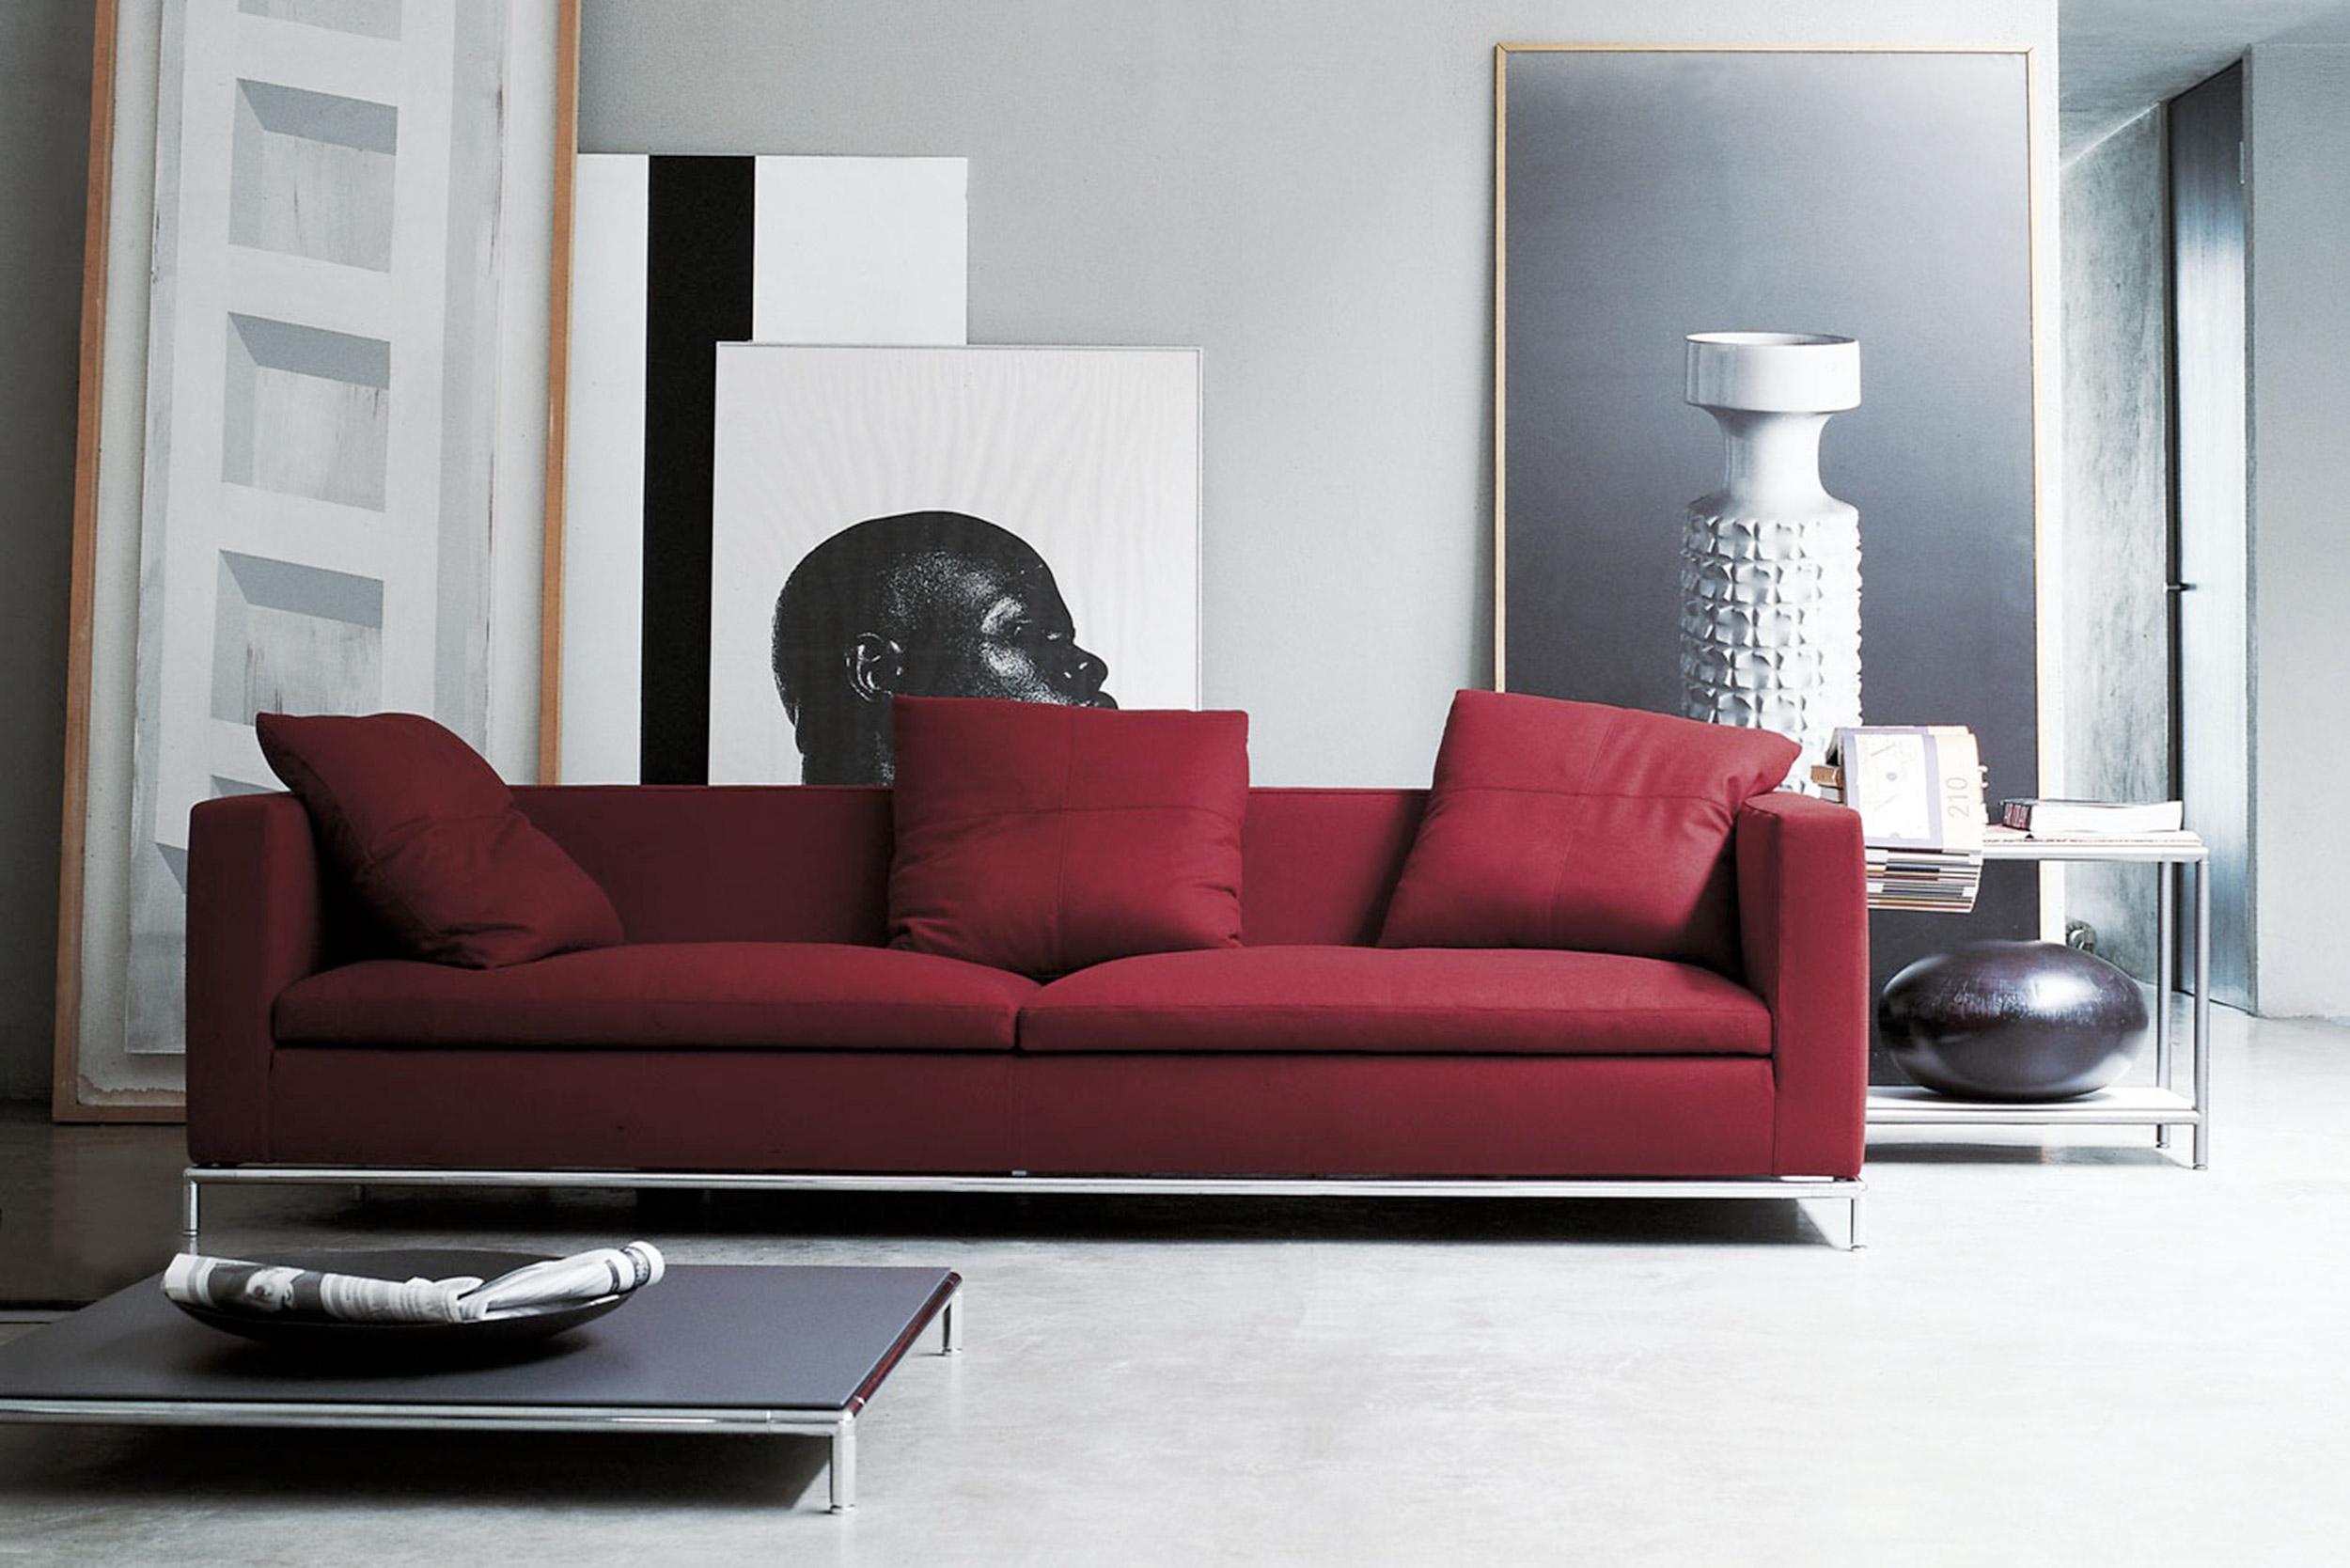 montage commercial b b italia. Black Bedroom Furniture Sets. Home Design Ideas